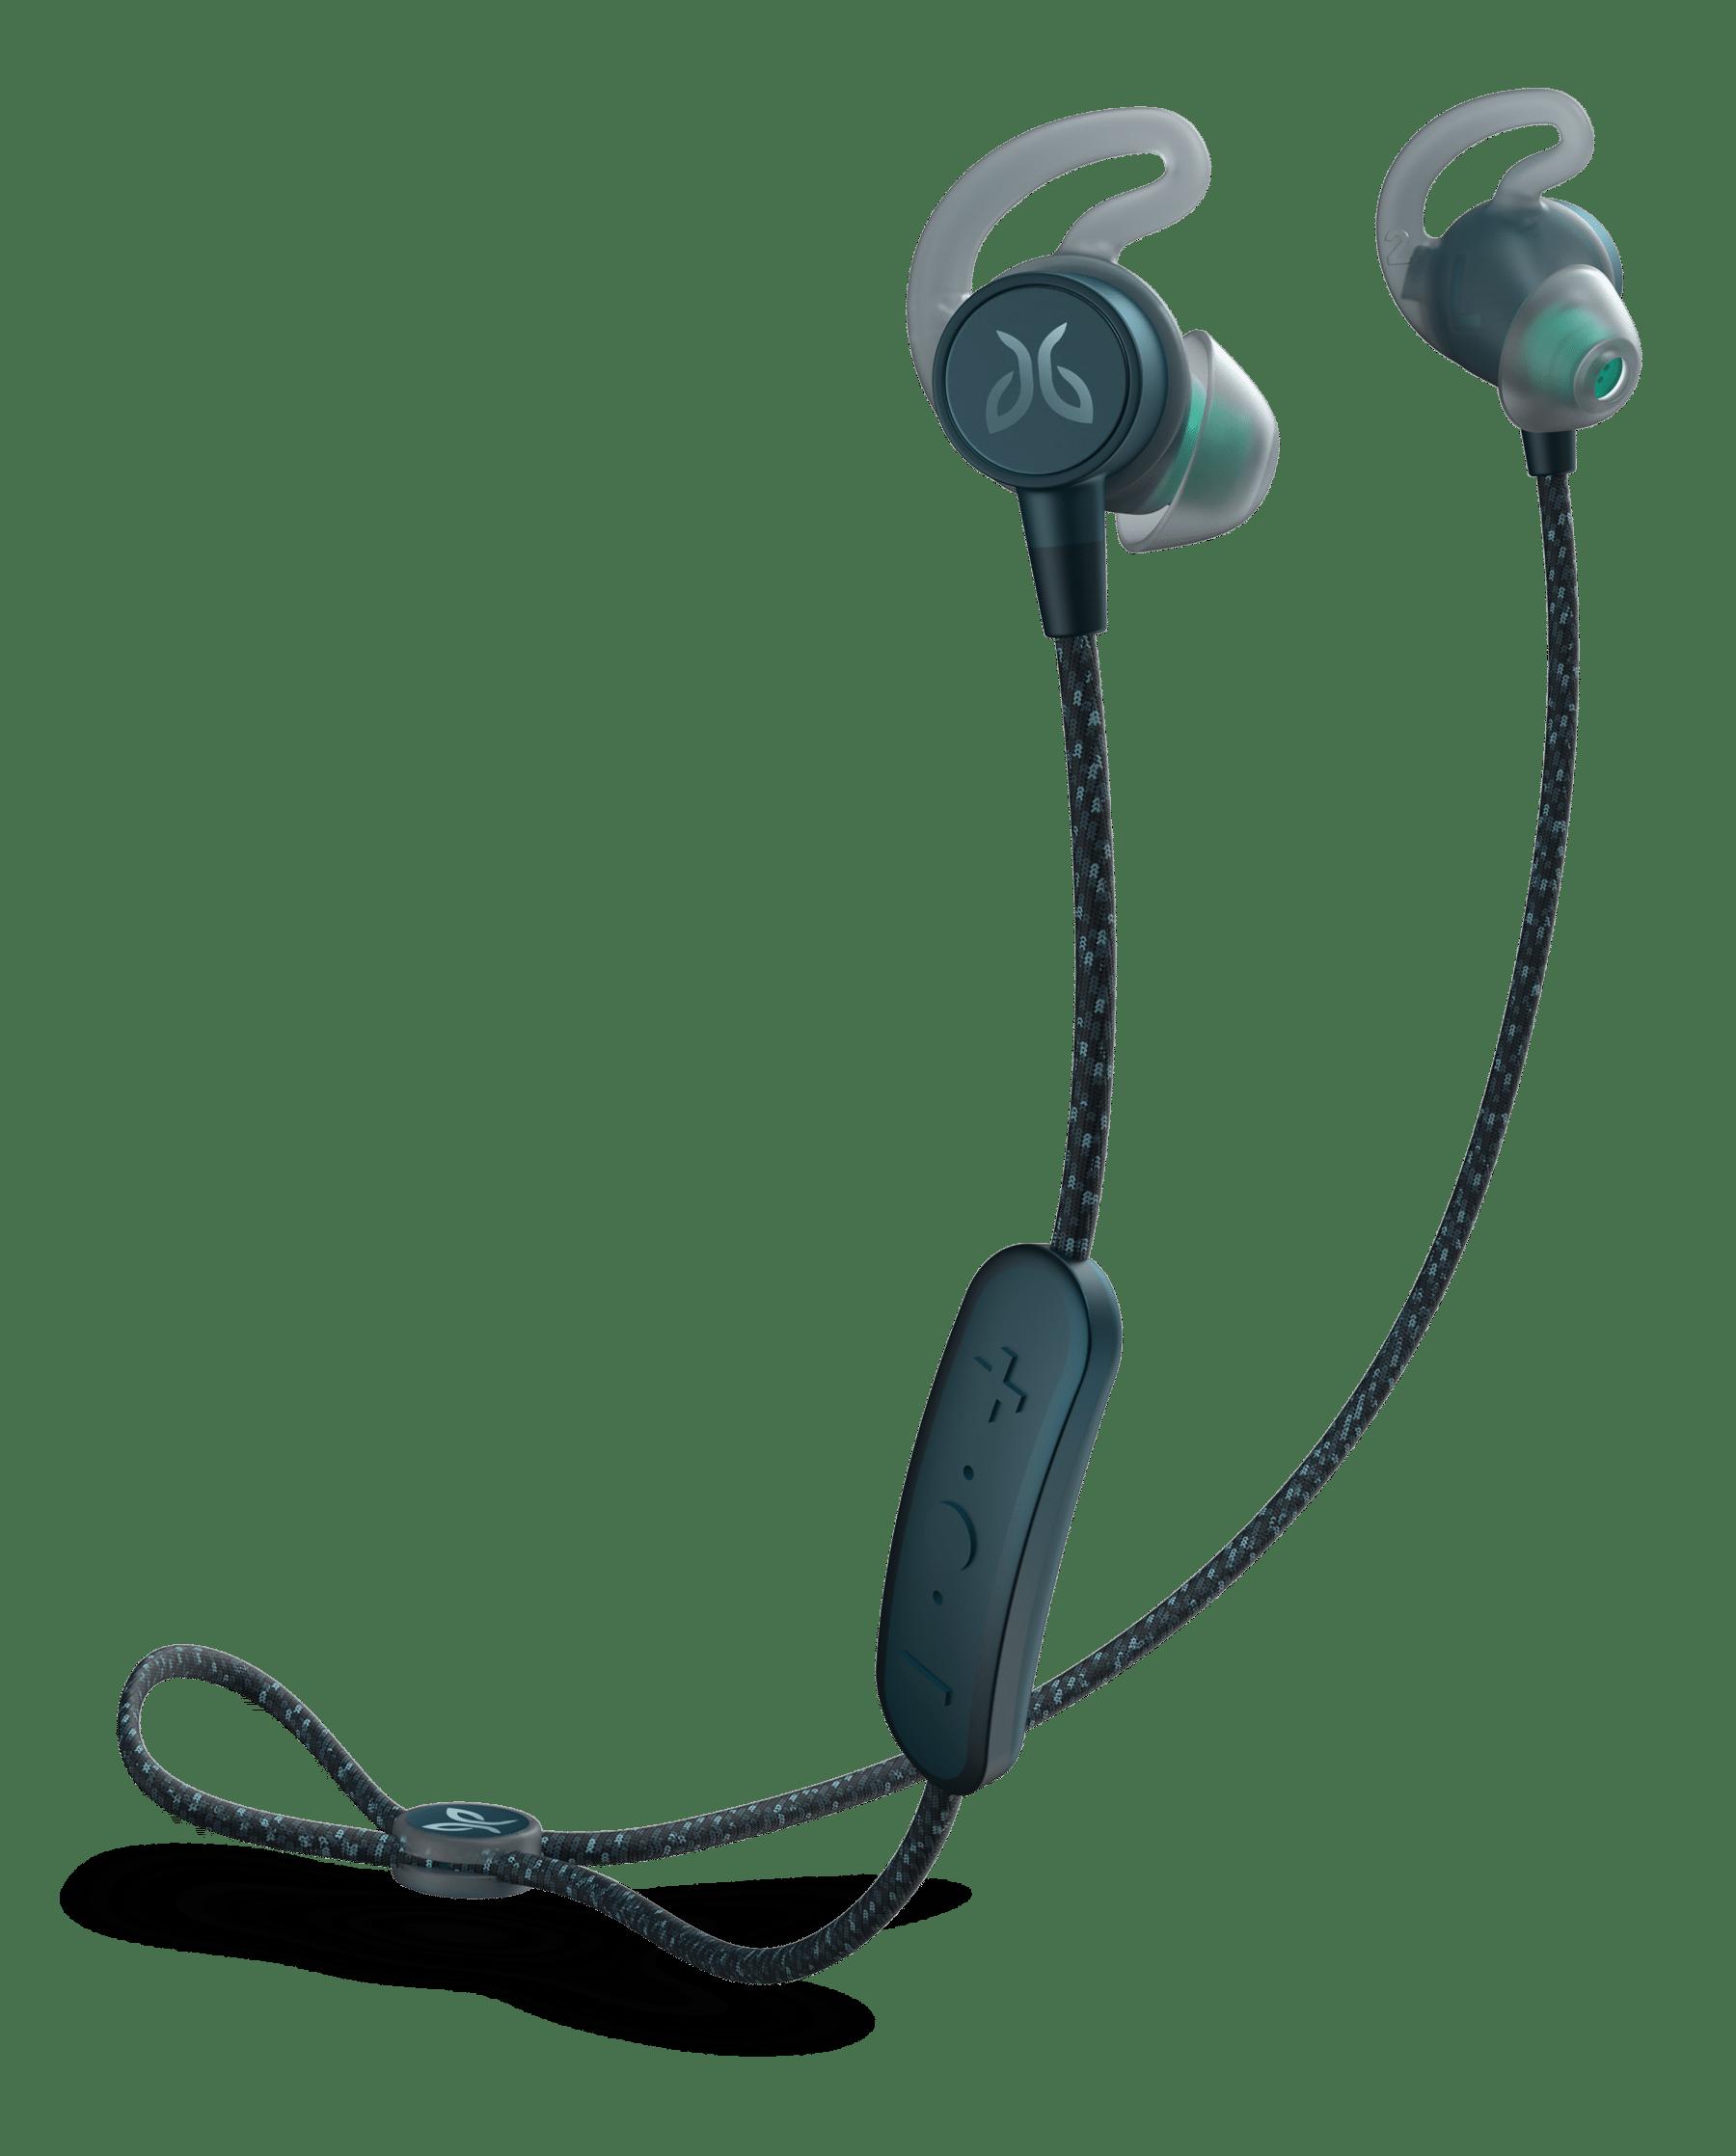 jaybird's headphone all over view